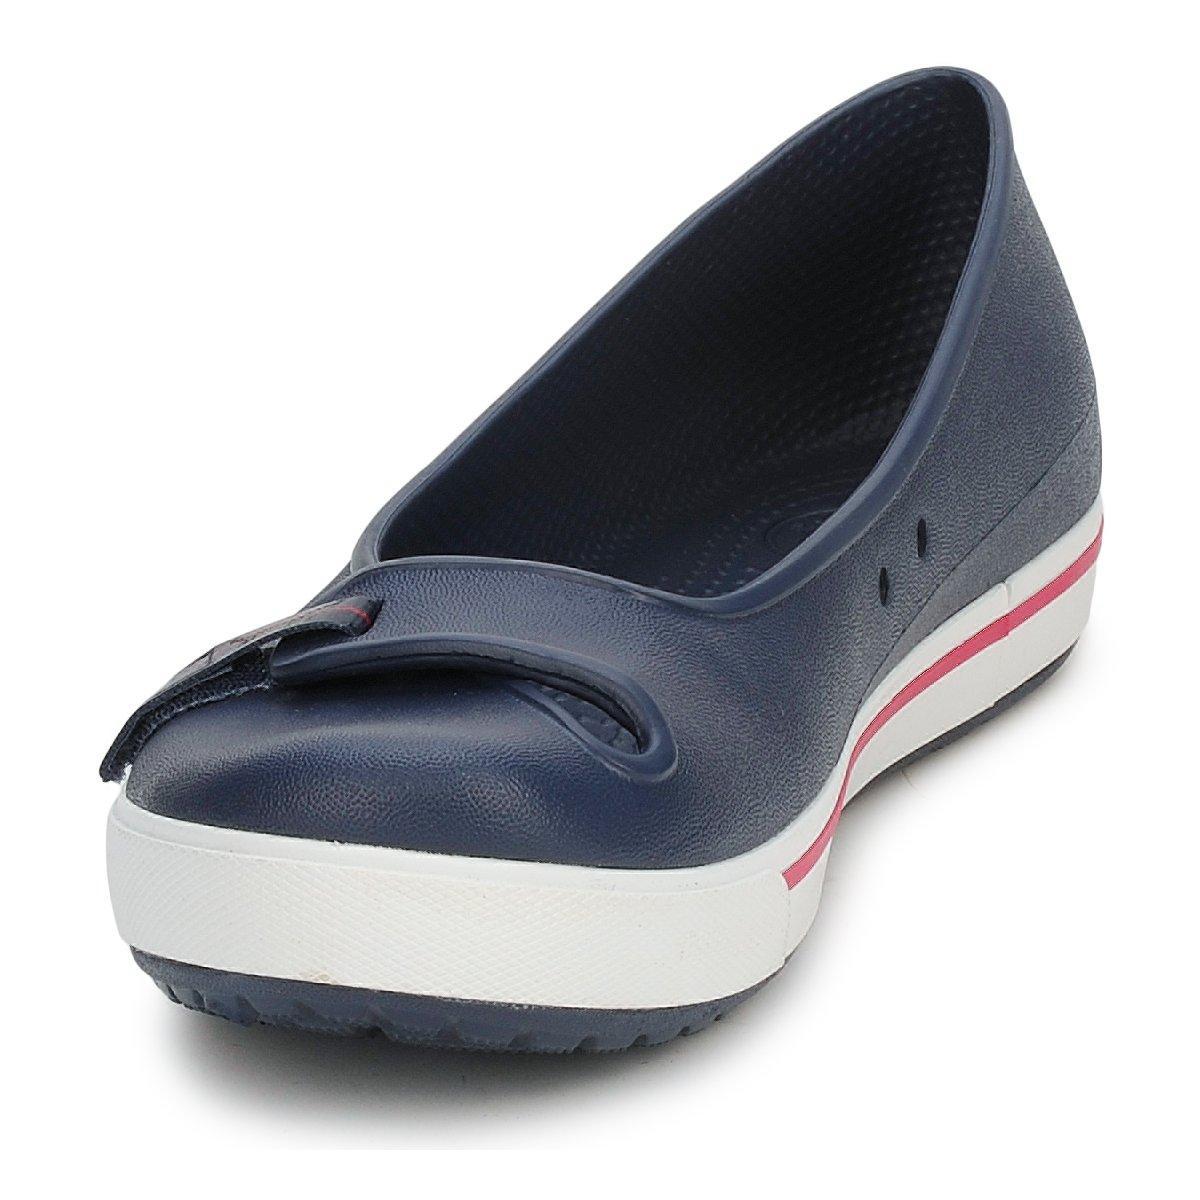 ec775bc41f11 Crocs™ Crocband Ii.5 Flat Women s Shoes (pumps   Ballerinas) In Blue ...